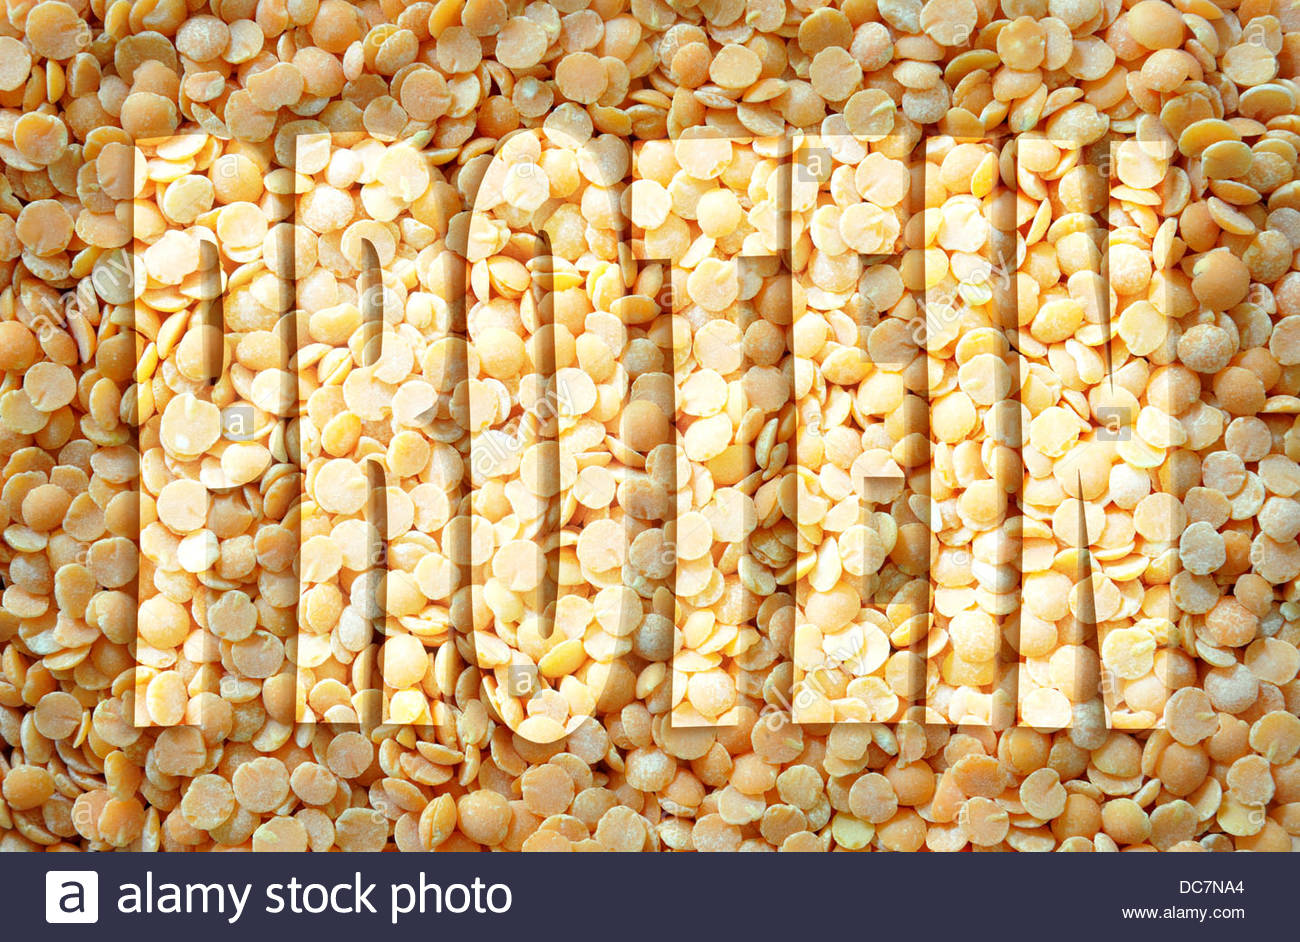 Digital composite. Orange split lentils - protein - Stock Image